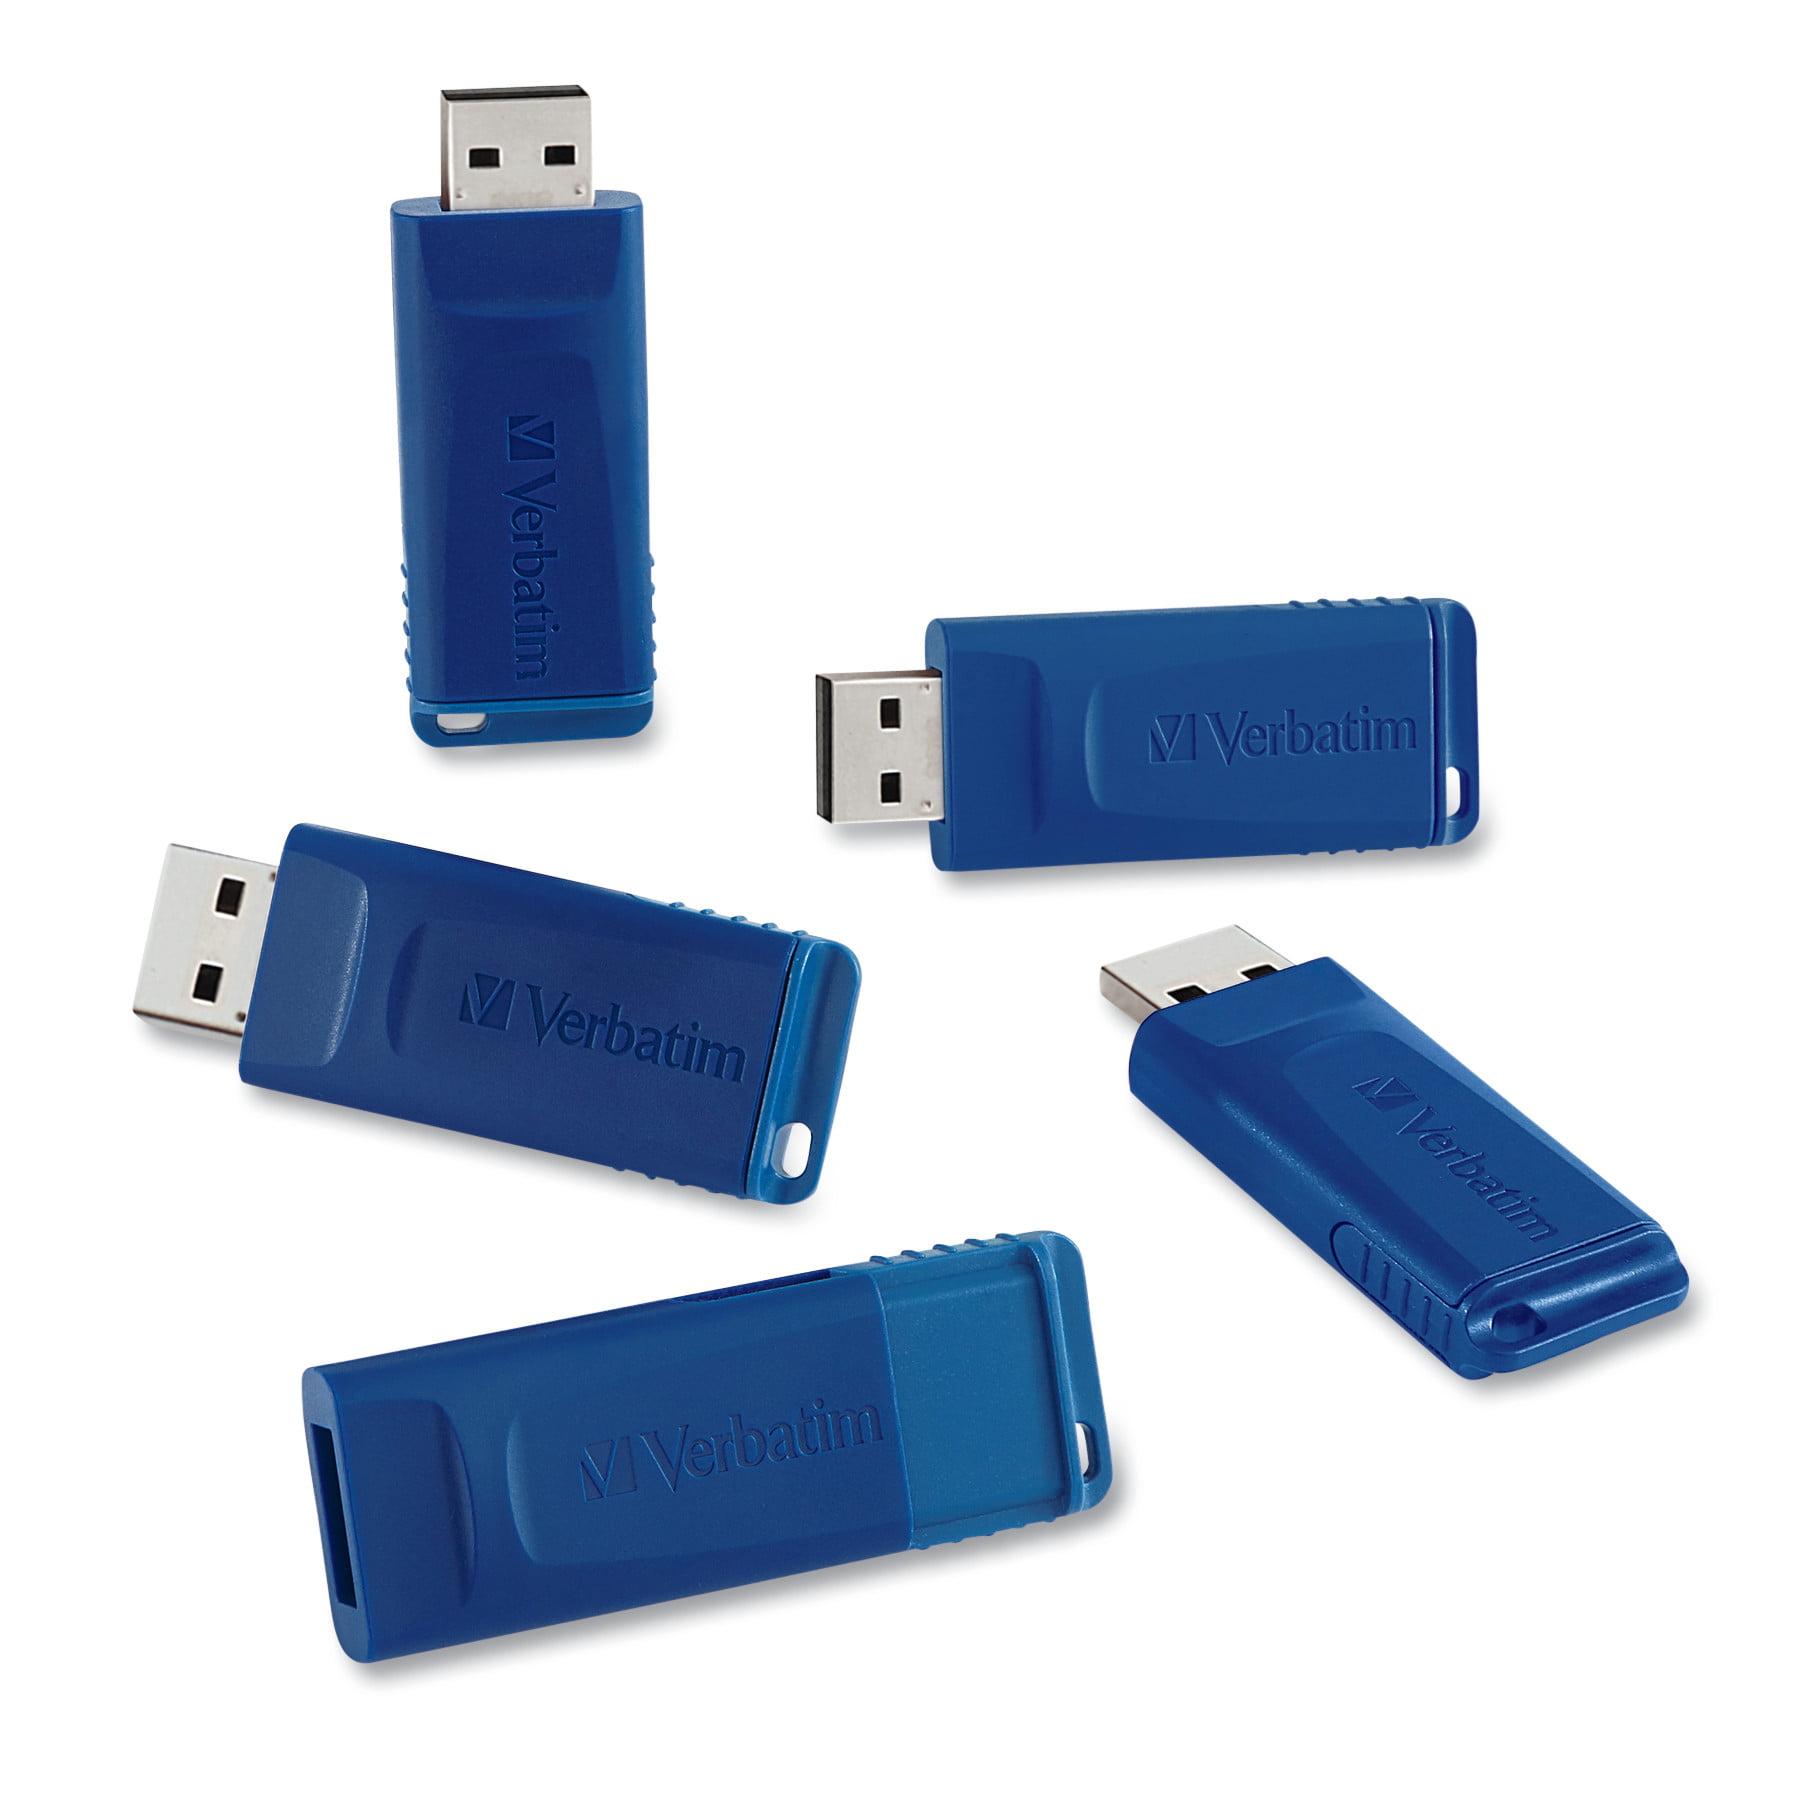 Verbatim Classic USB 2.0 Flash Drive, 8 GB, Blue, 5/PK -VER99810